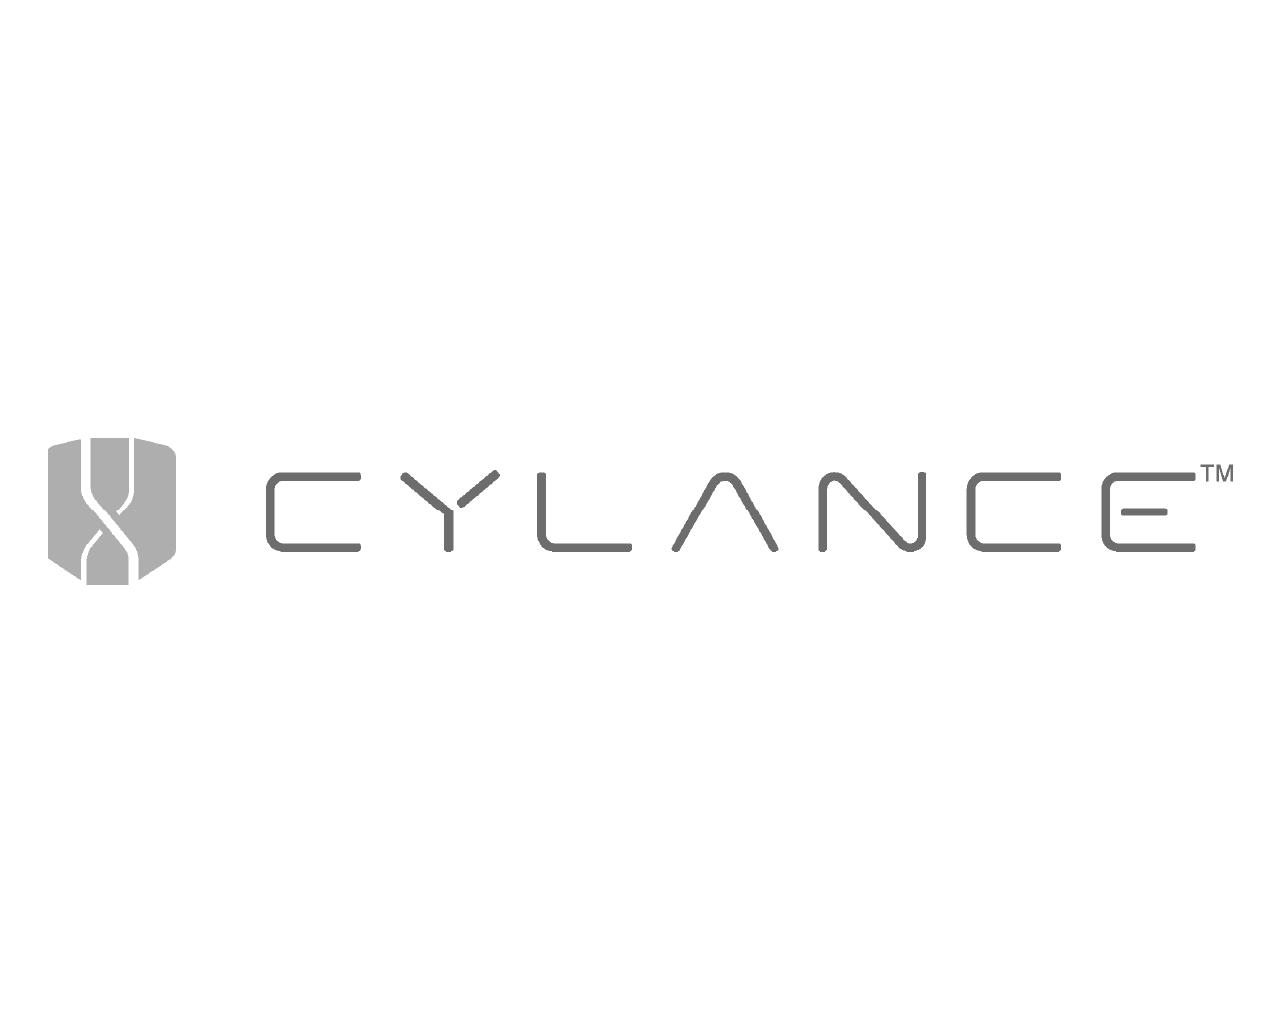 cylance logo bw